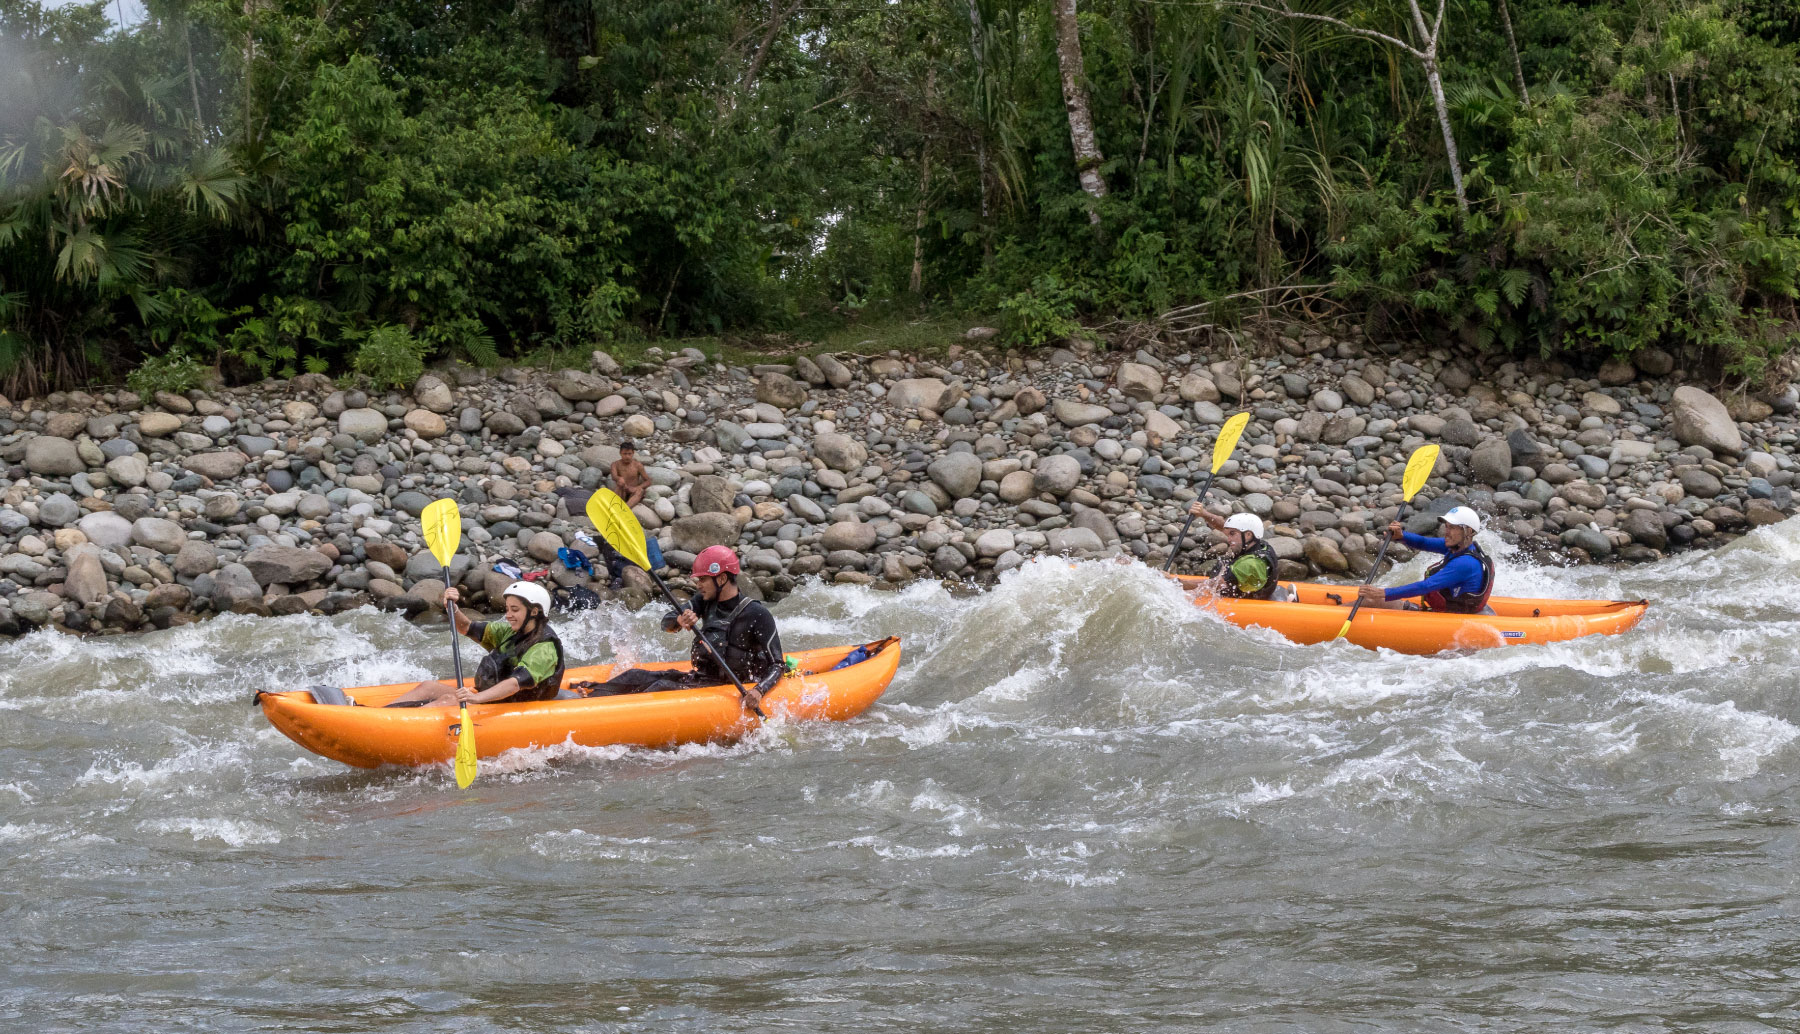 Two duckies in Jatunyacu river enjoying the trip